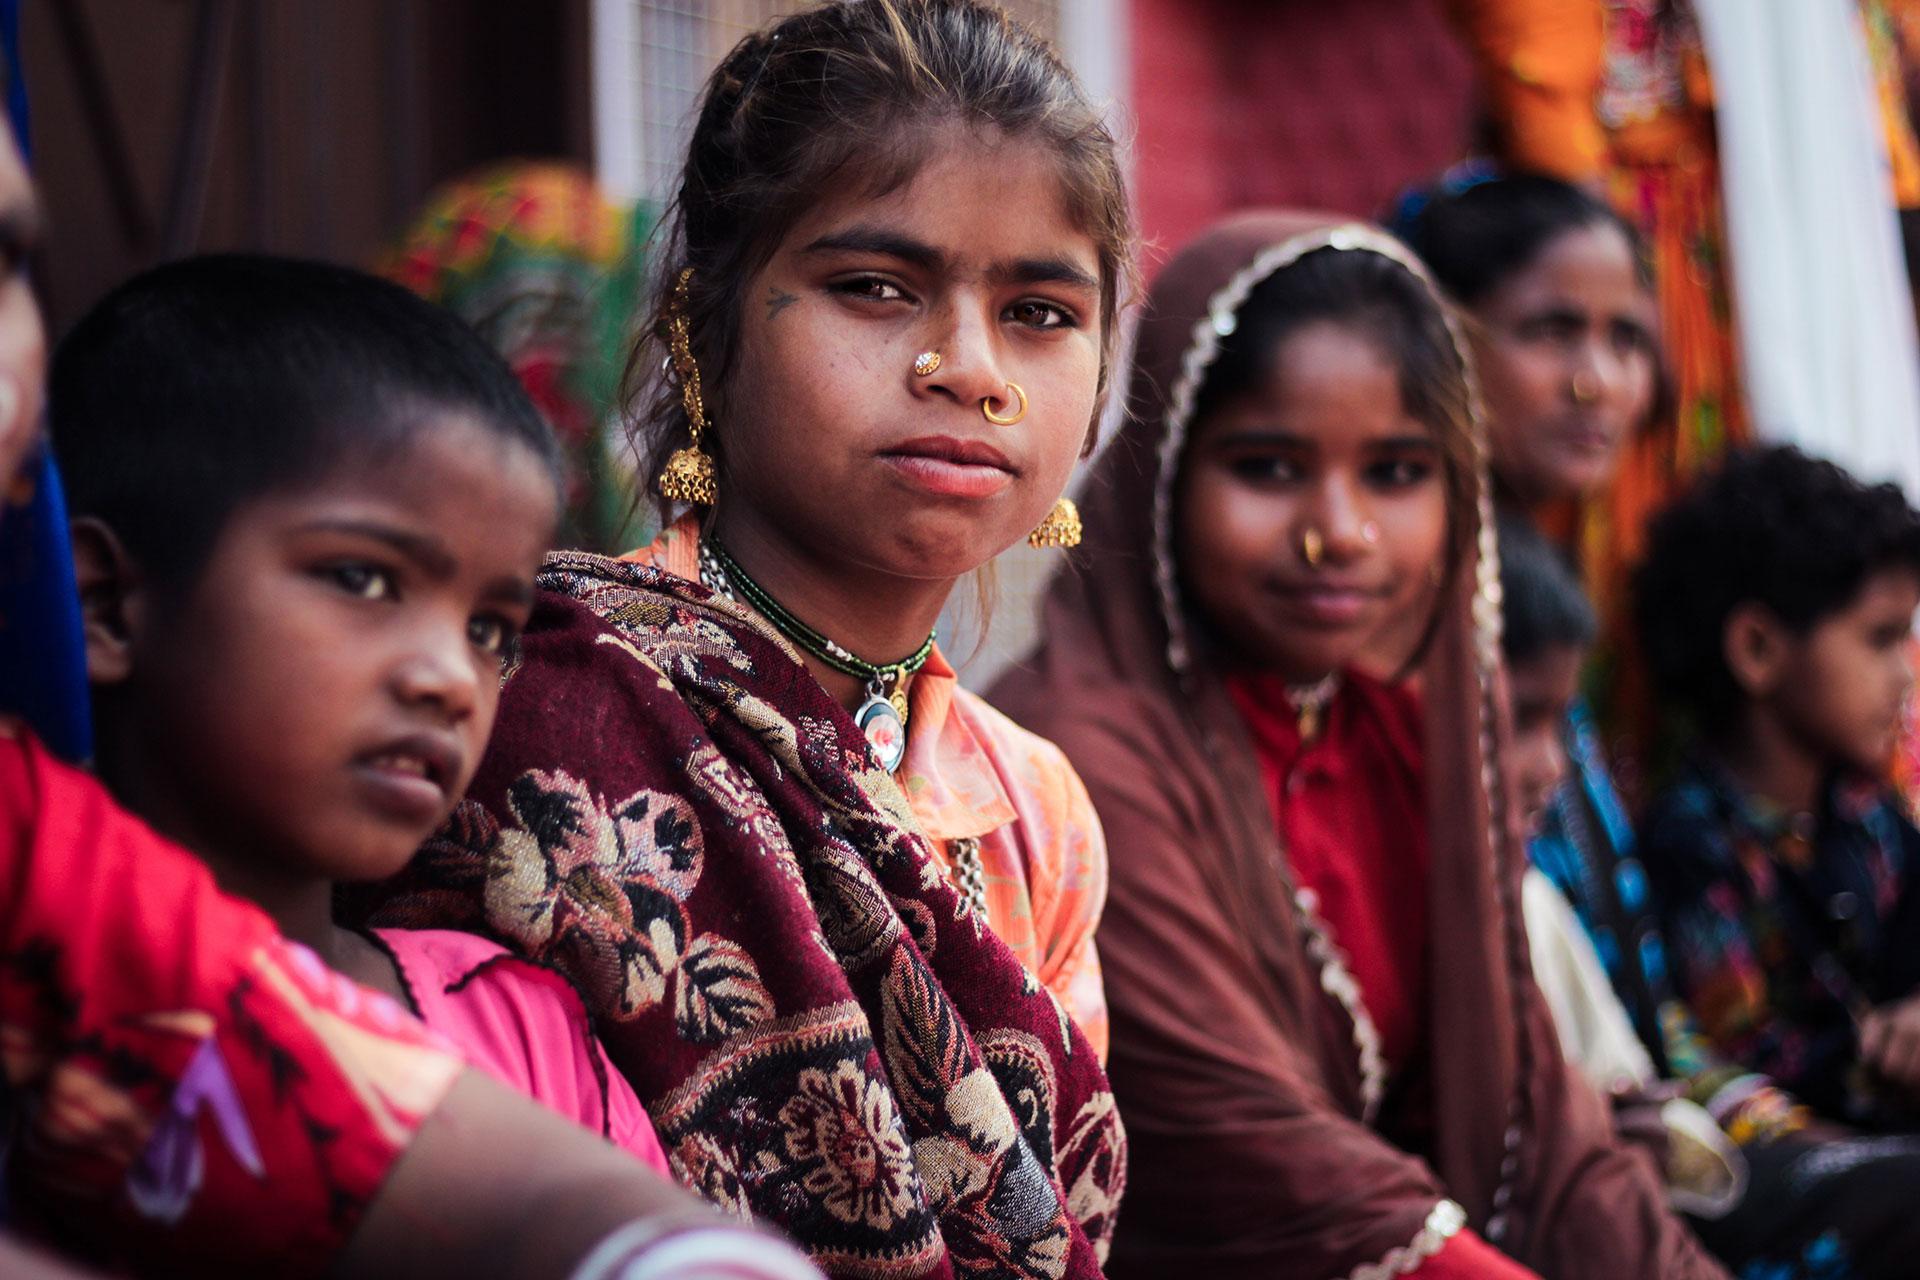 IAAH   The International Association of Adolescent Health